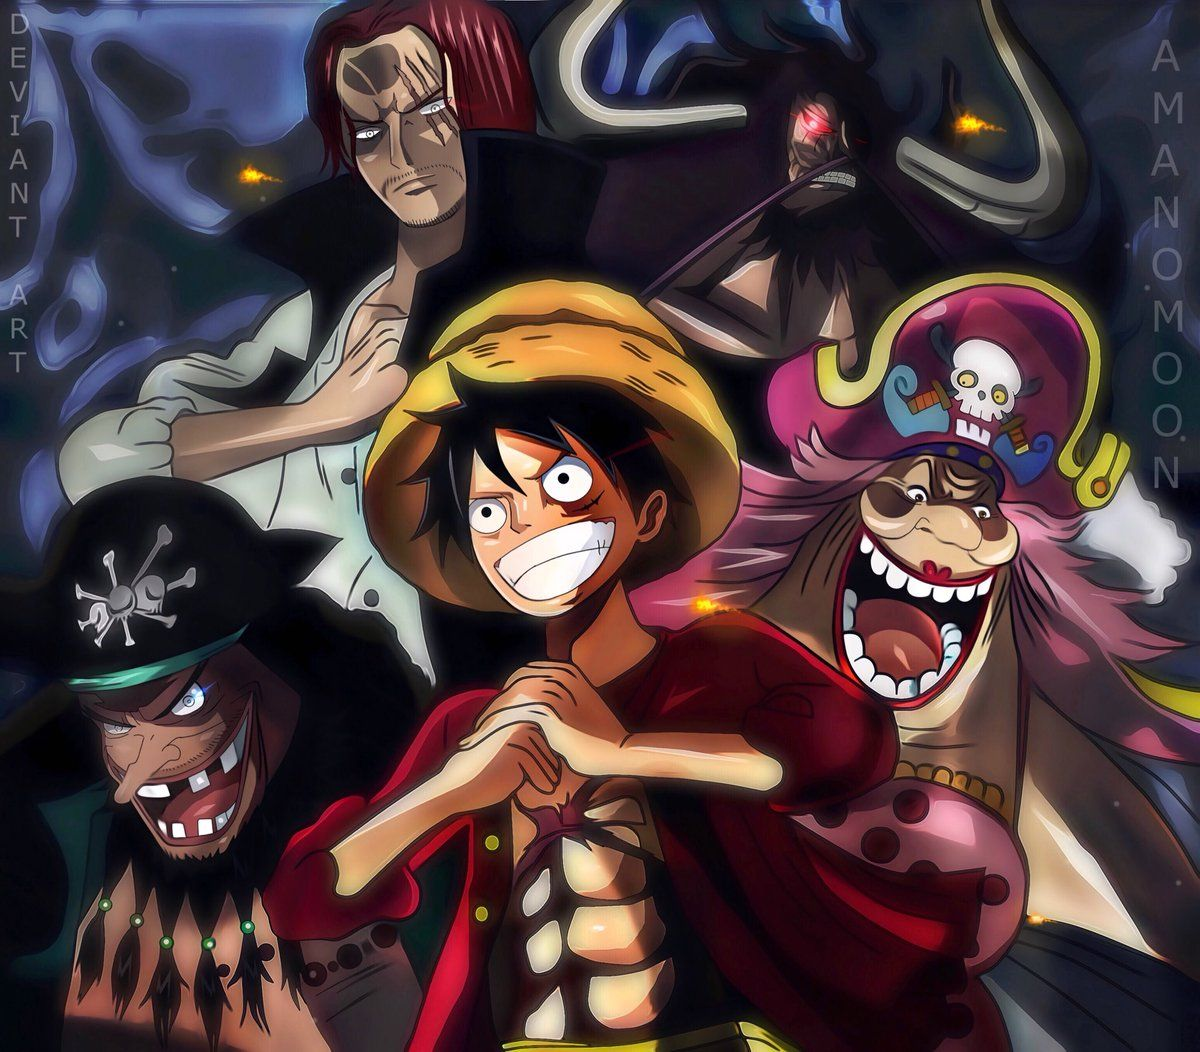 Monkey D Luffy Yonko One Piece Anime